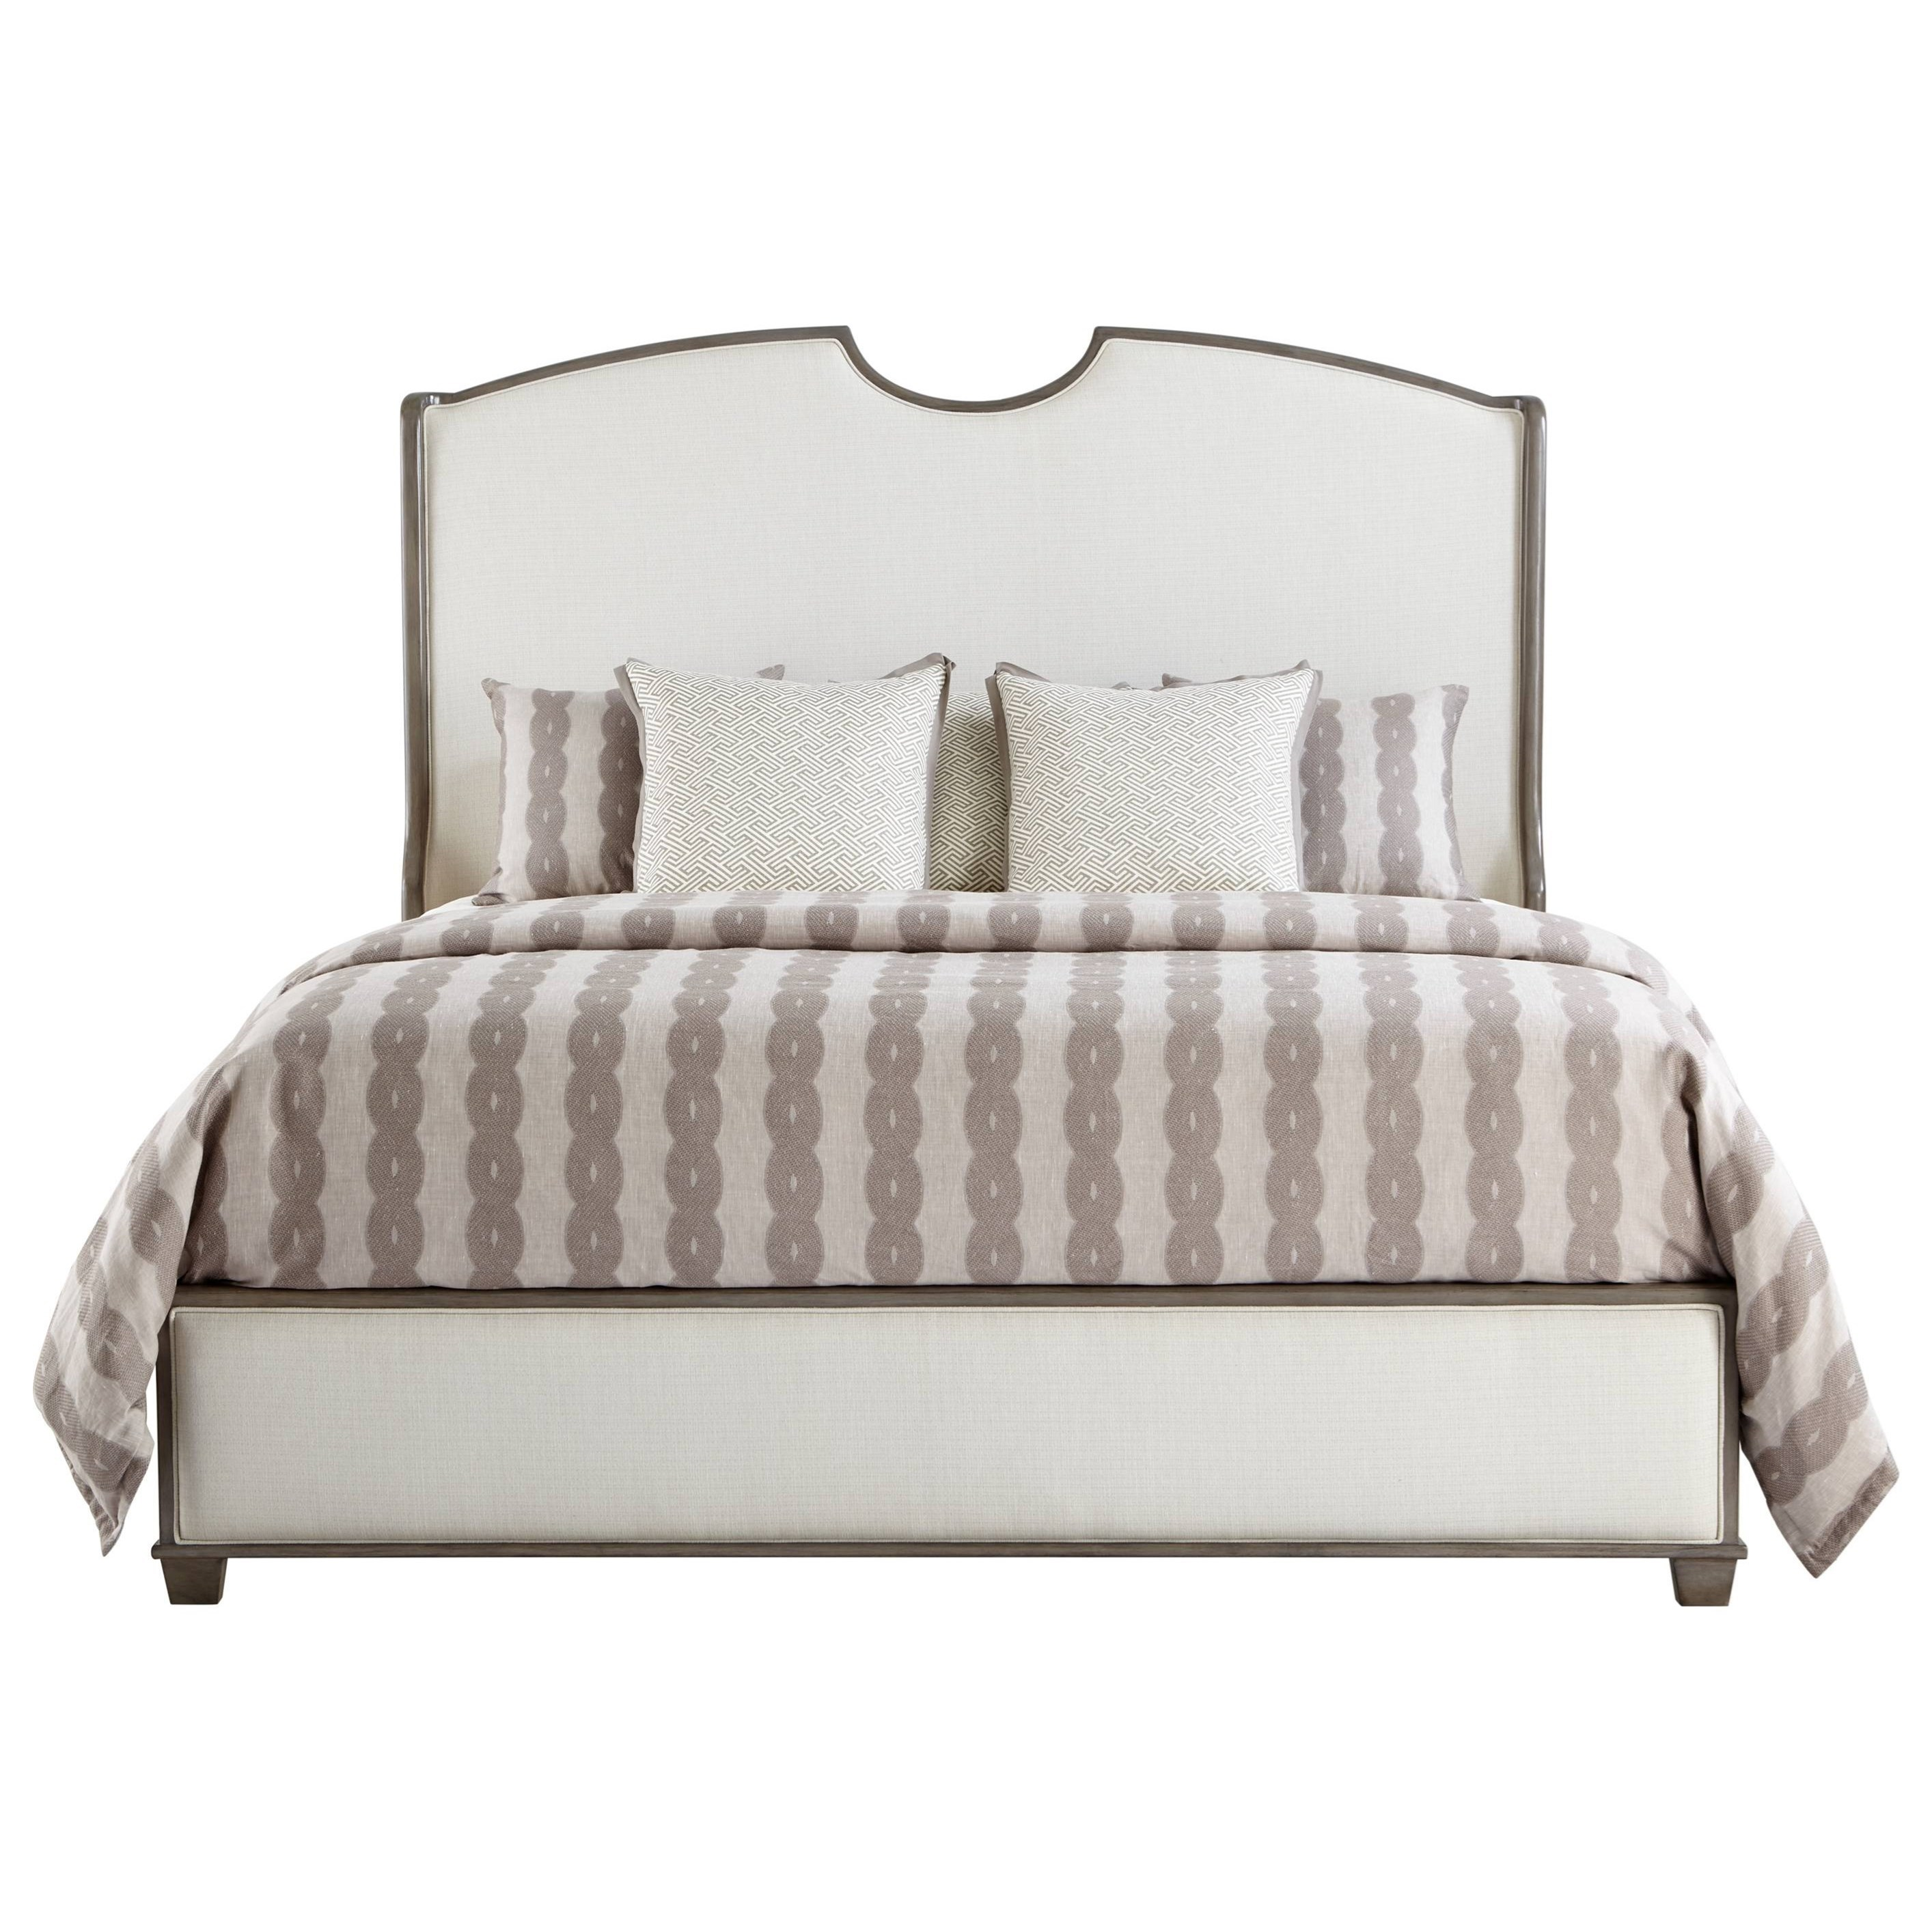 Stanley Furniture Coastal Living Oasis Queen Solstice Canyon Shelter Bed - Item Number: 527-63-42